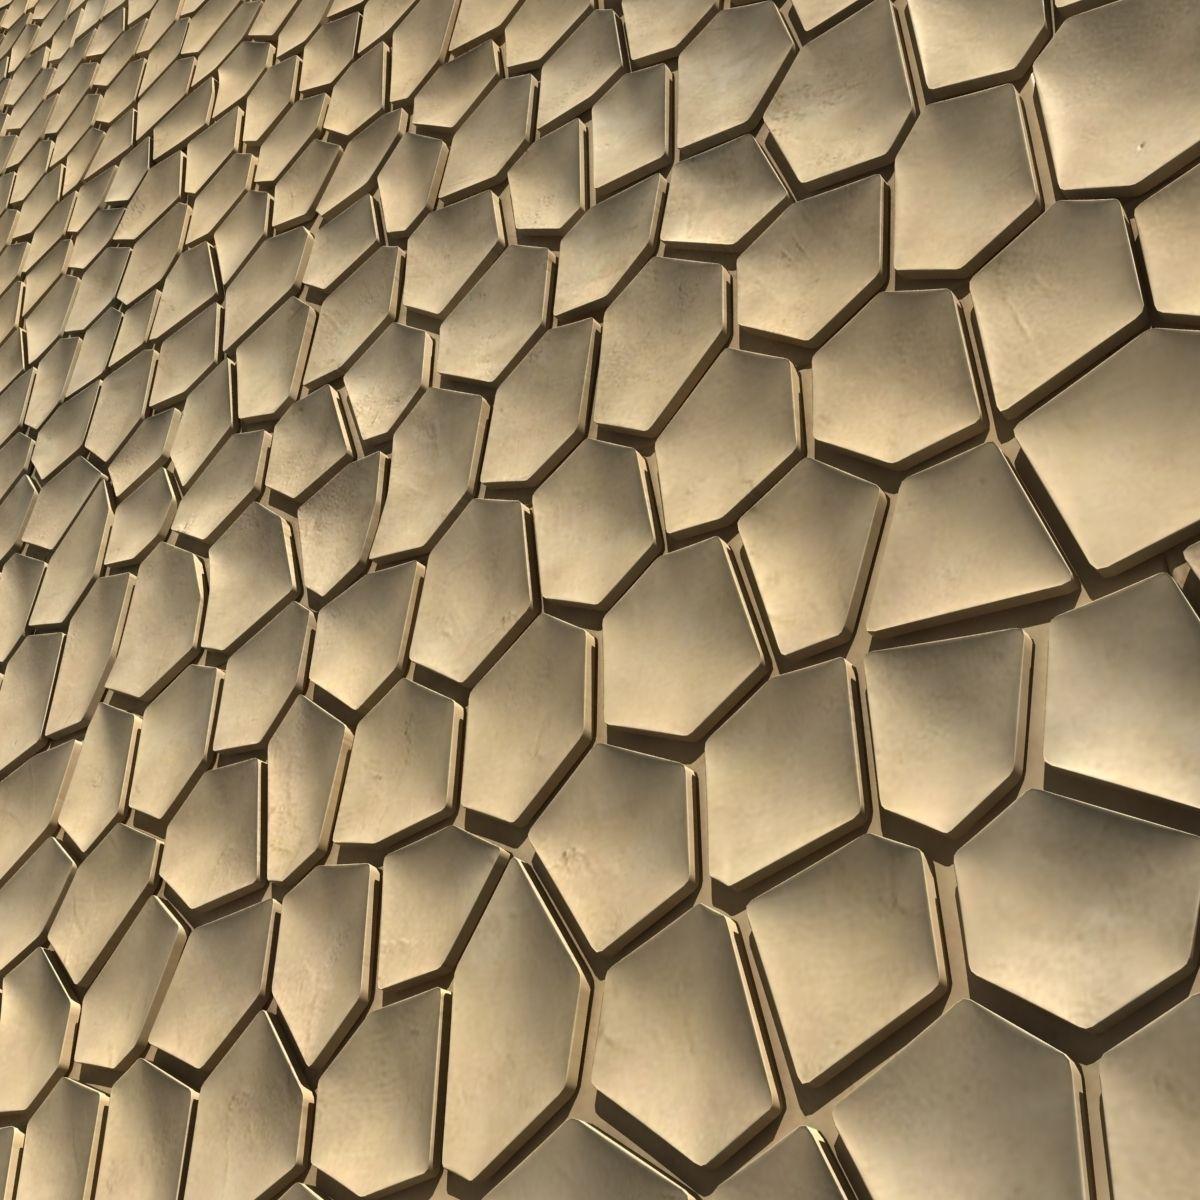 3d Wall Surfaces : D surface arido wall tiles mosaic model max obj ds